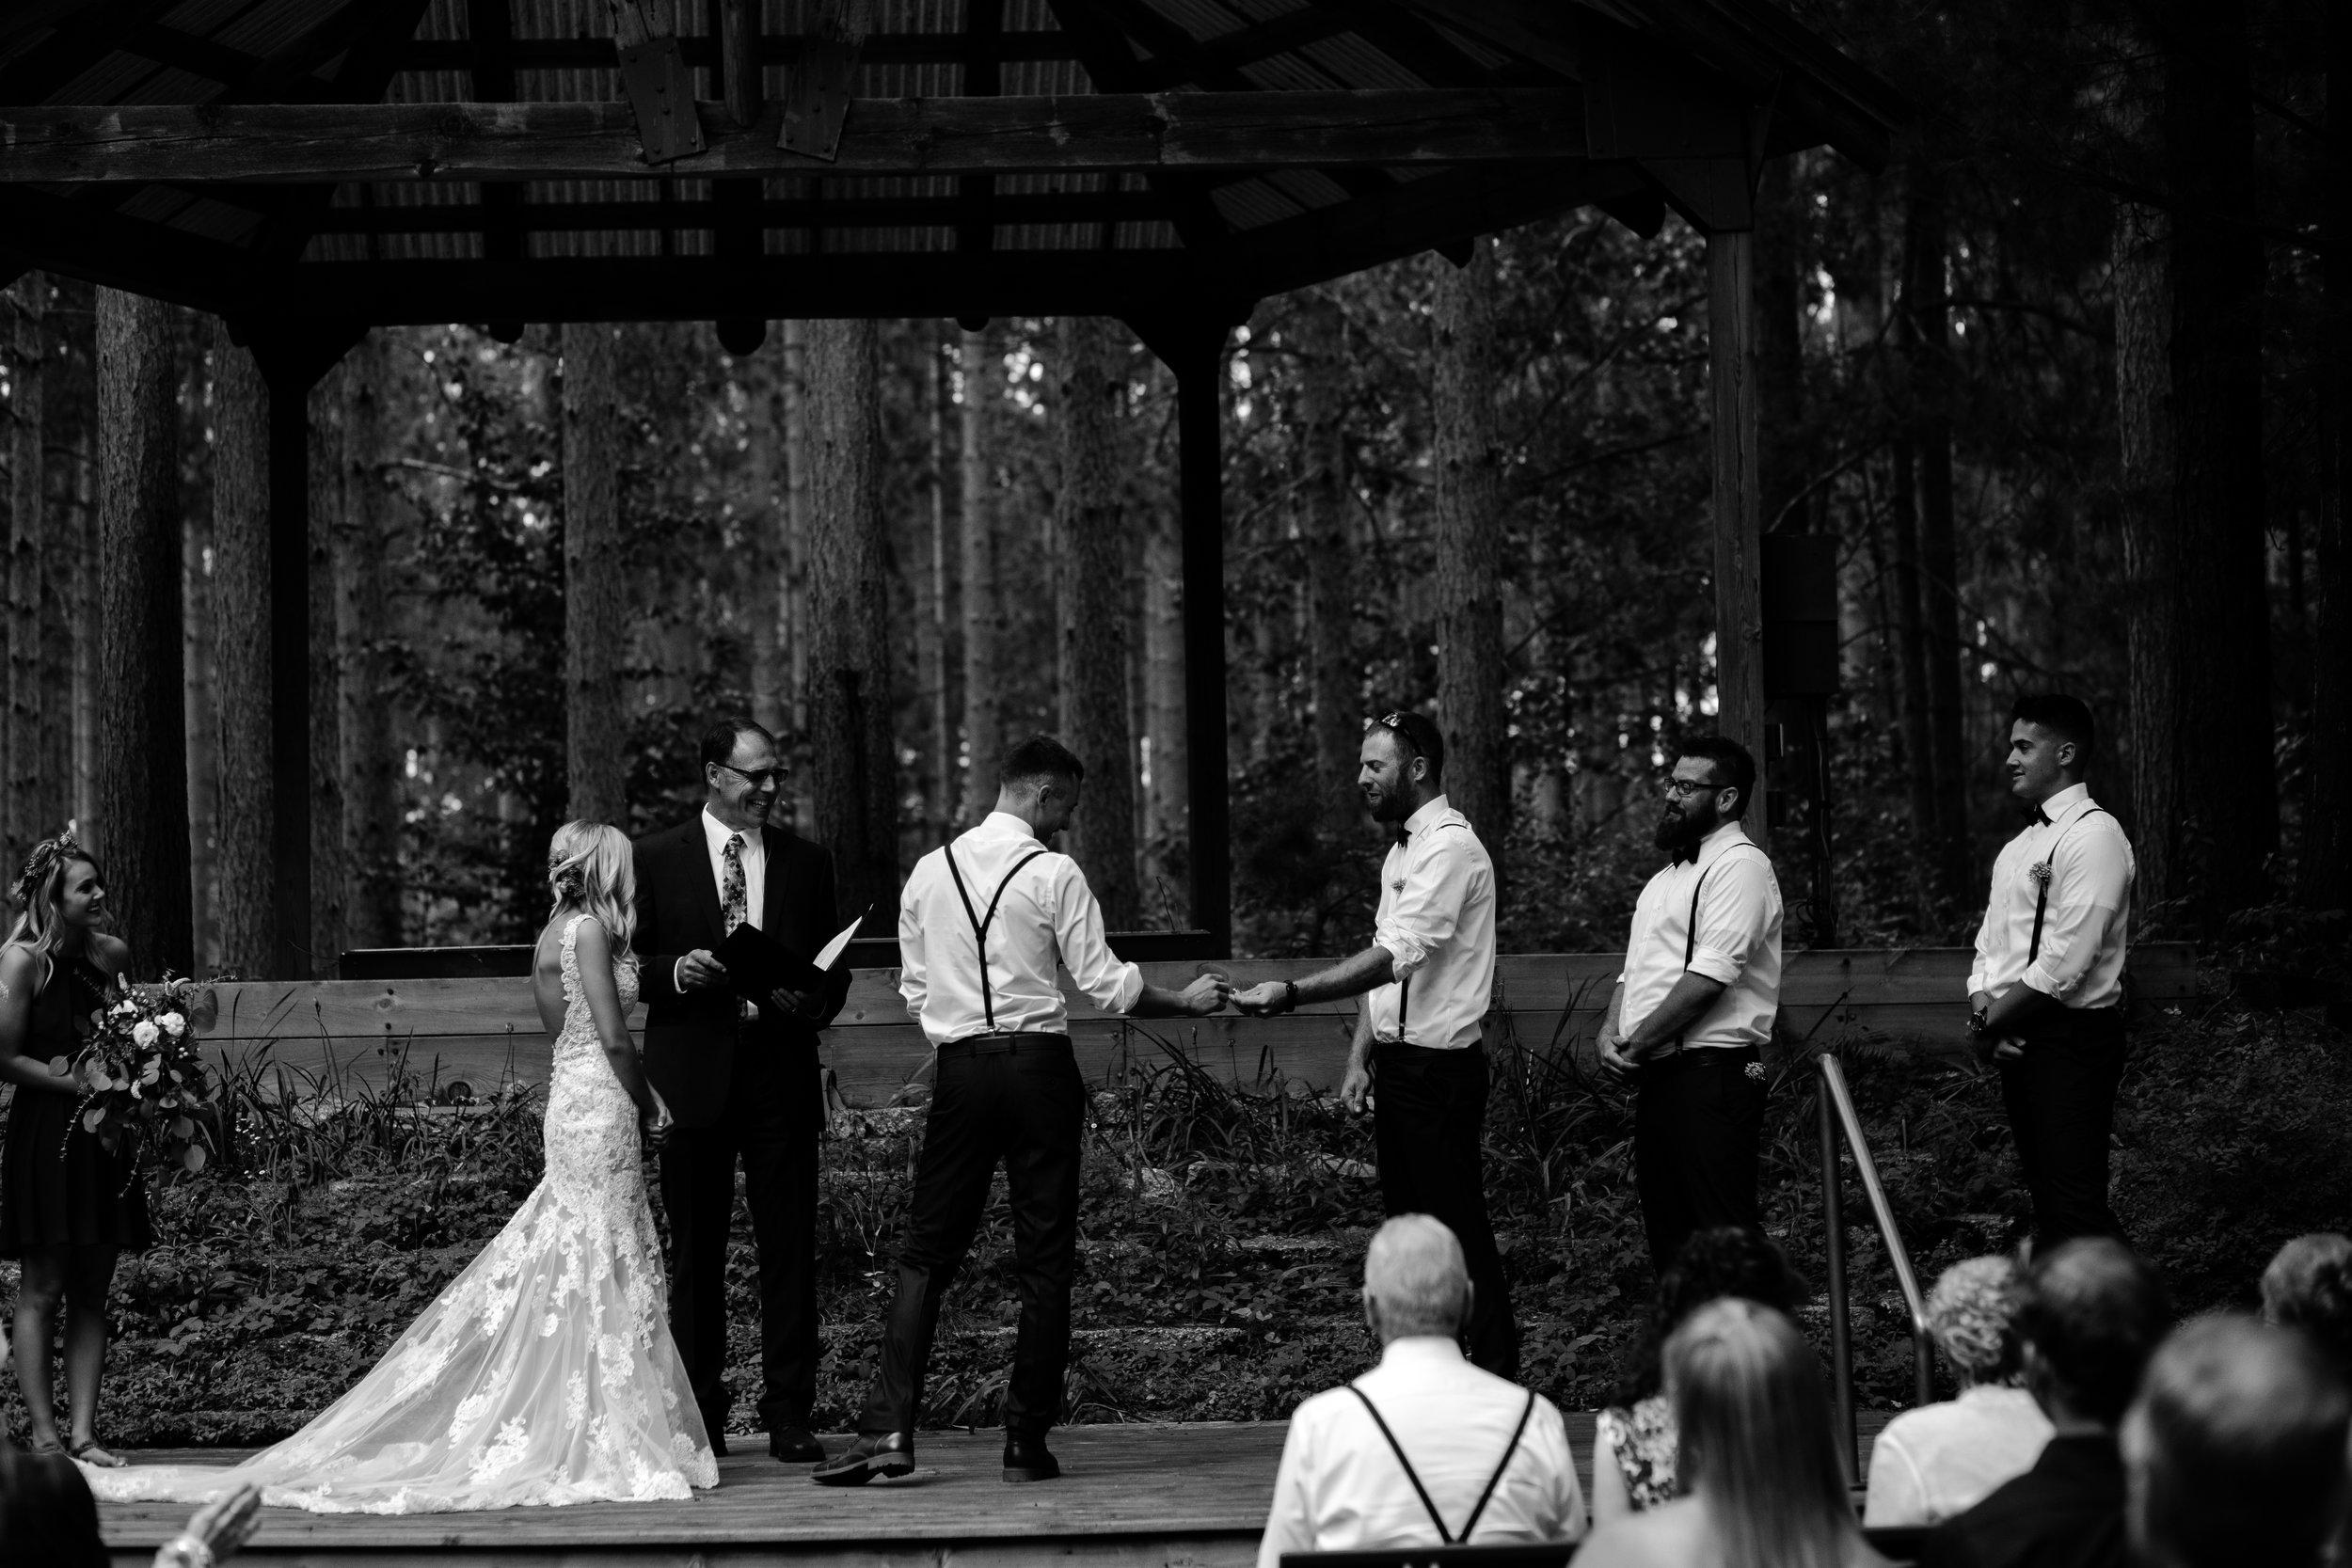 west-michigan-wedding-photographer-whitehall-rachel-austin-chapel-in-the-pines-289.jpg